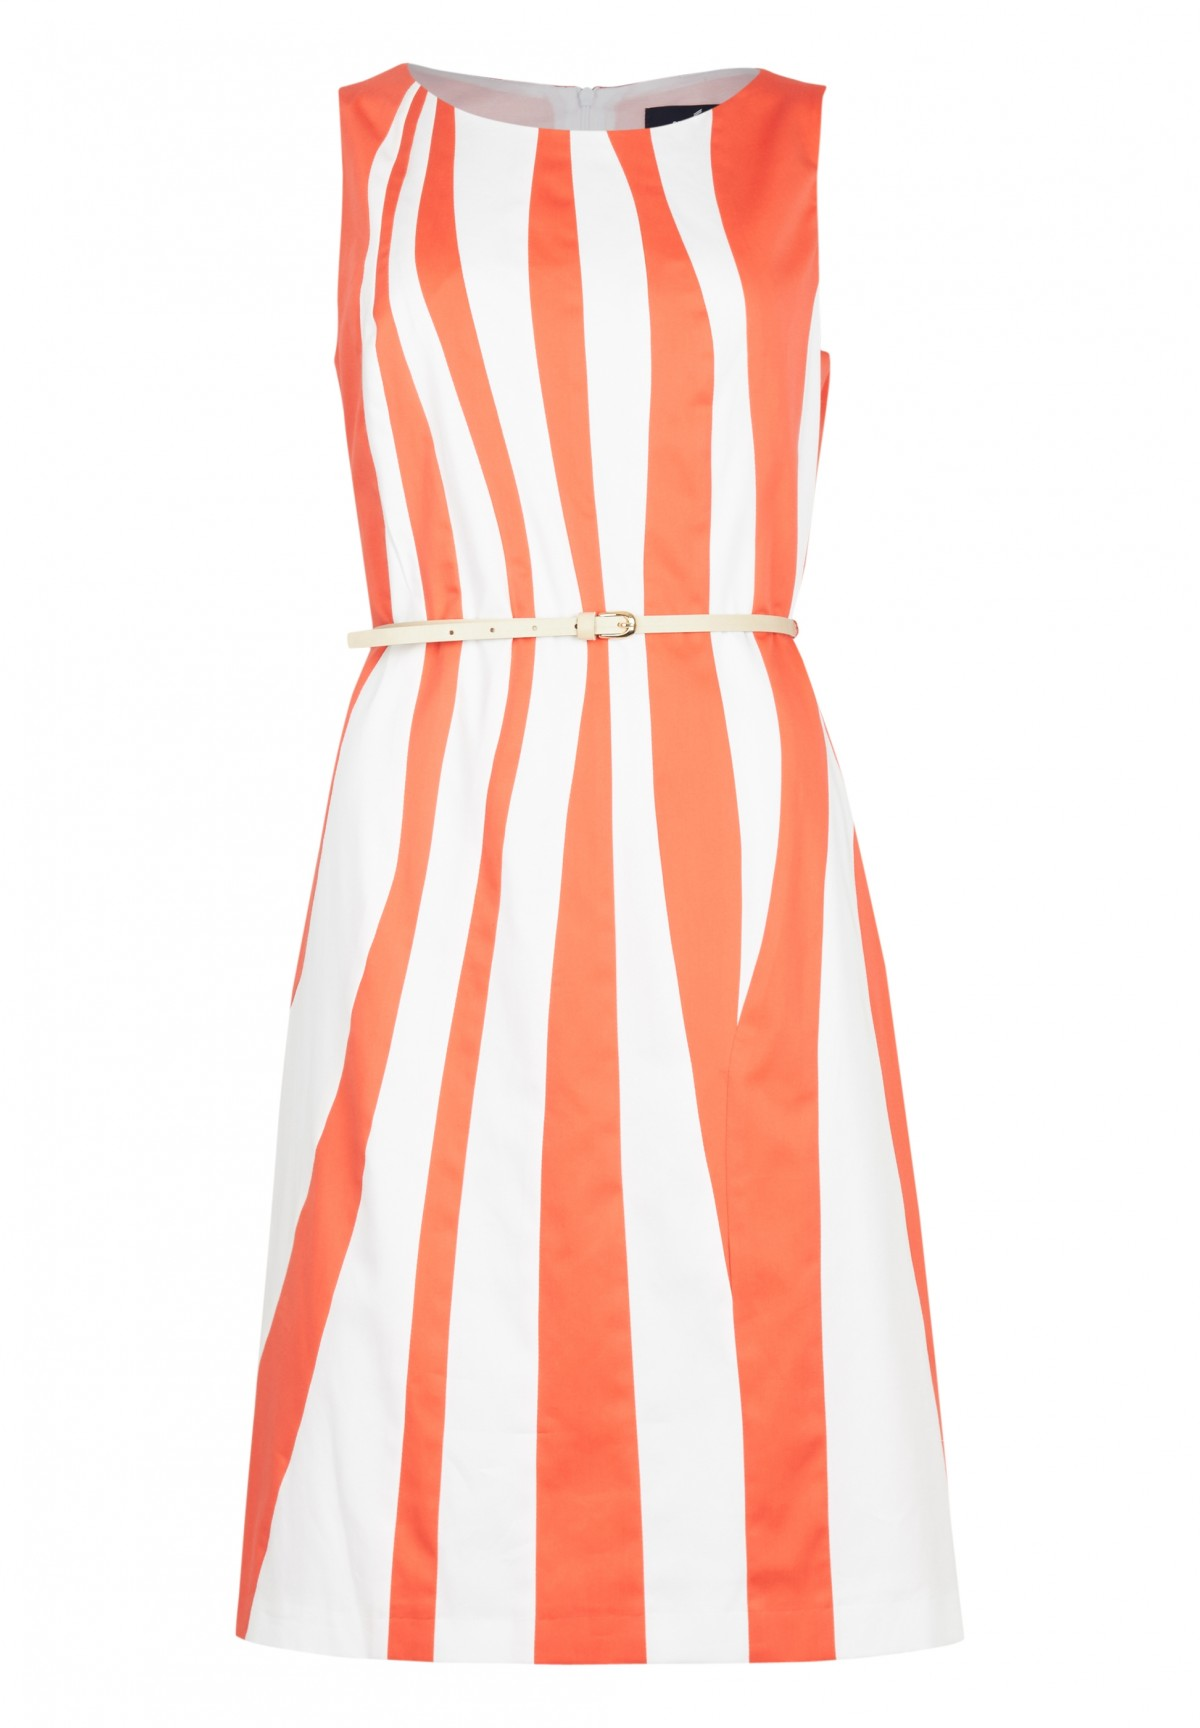 Kleid im Wellen-Design / Kleid